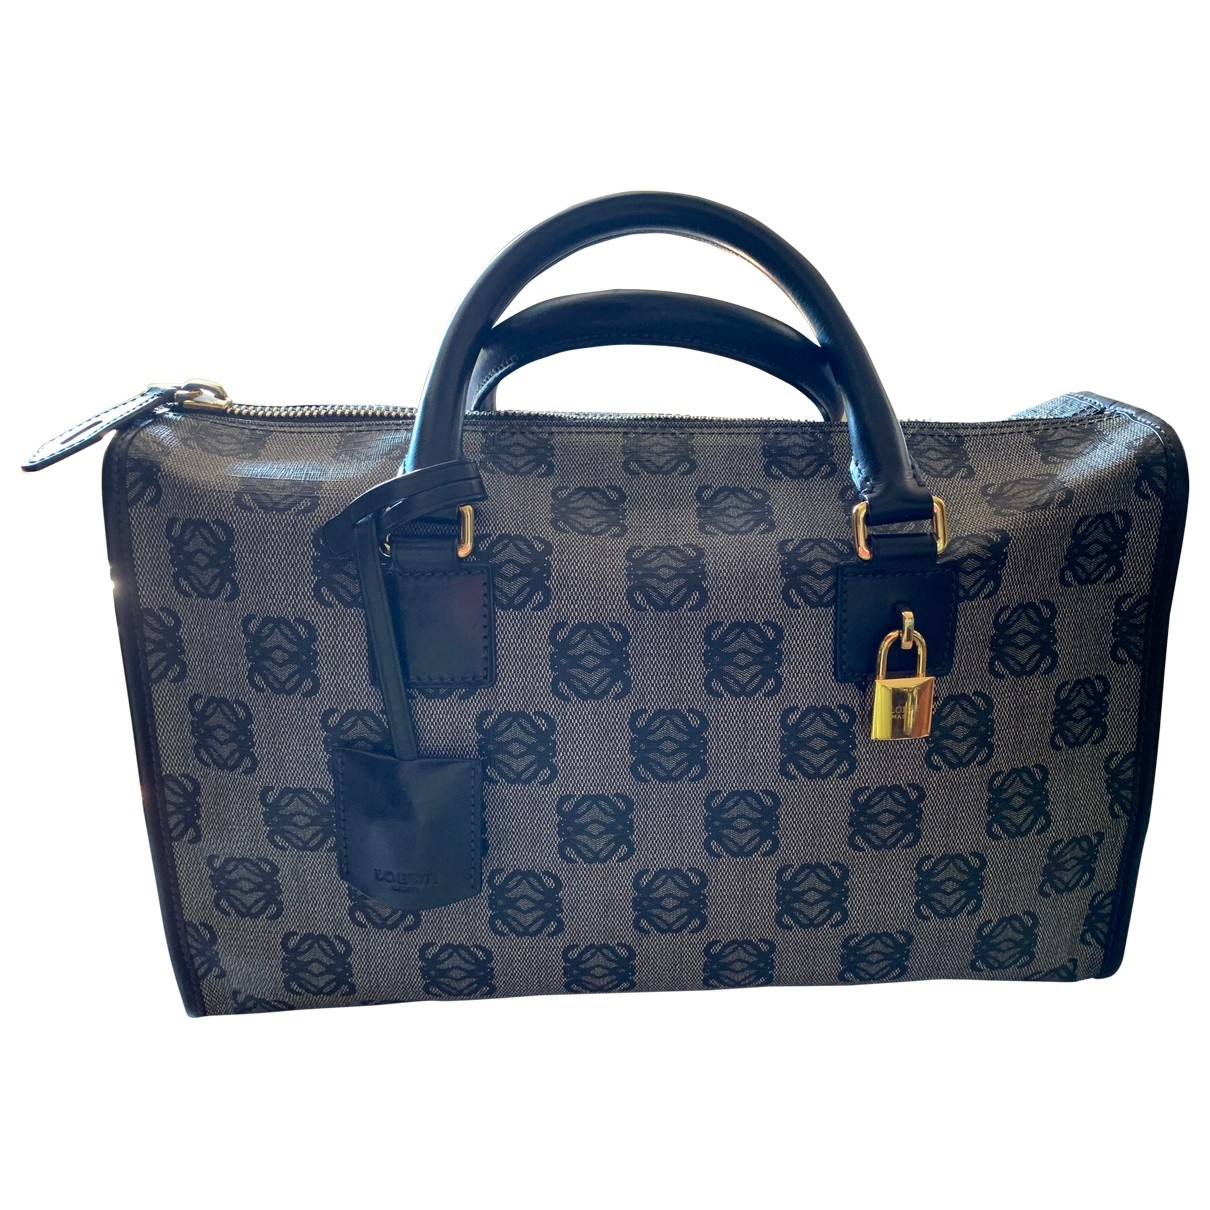 Loewe \N Handtasche in  Blau Leinen